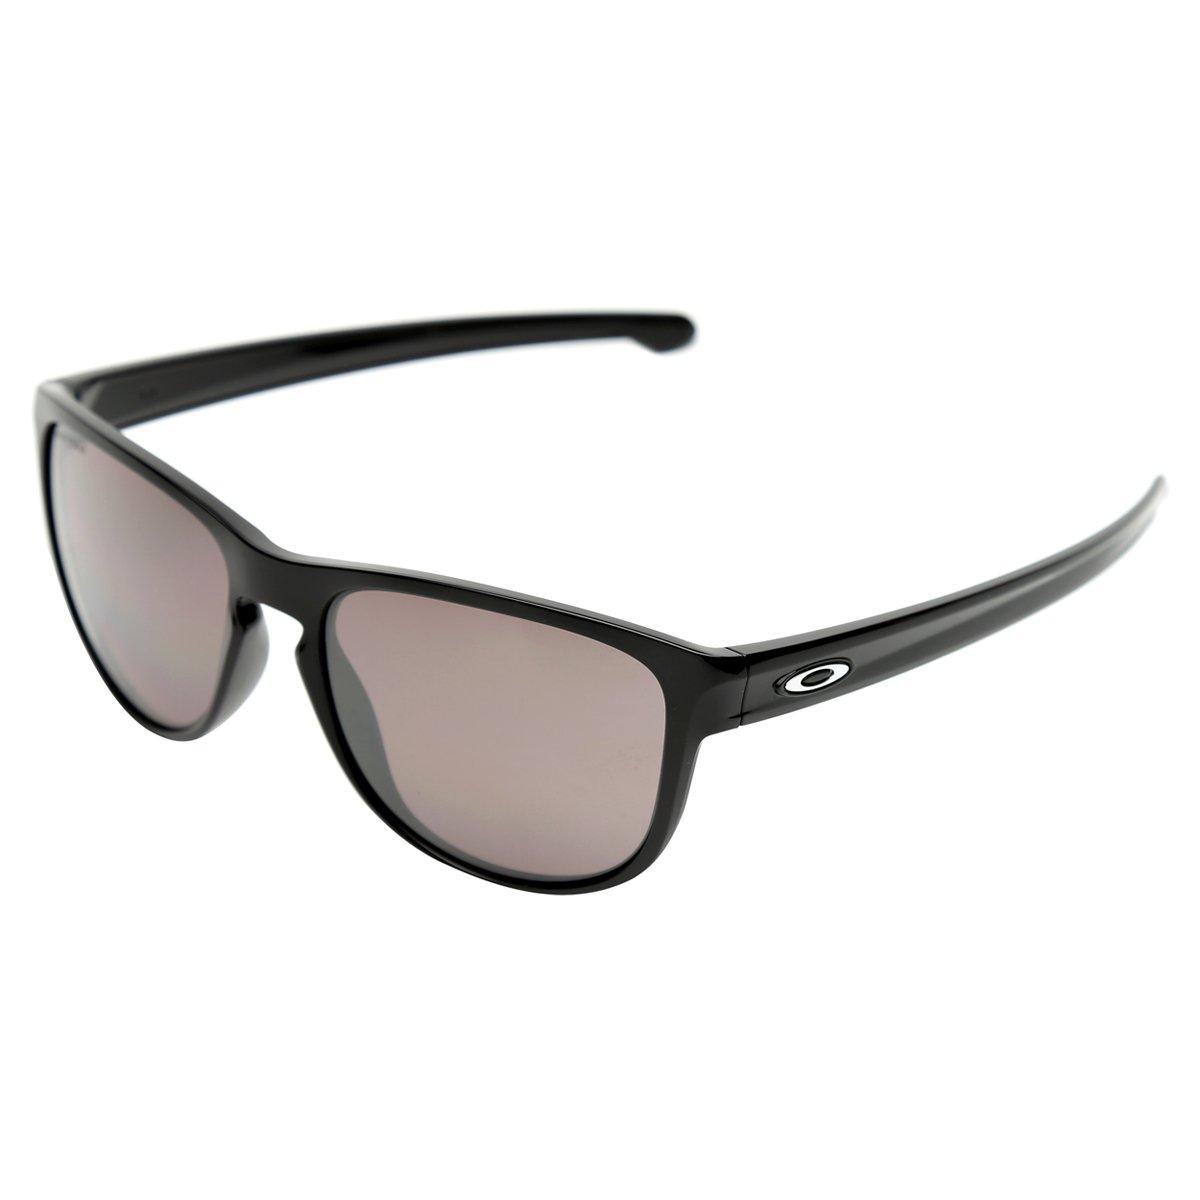 Óculos Oakley Sliver R-Prizm Daily Polarized - Compre Agora   Netshoes c61986df73